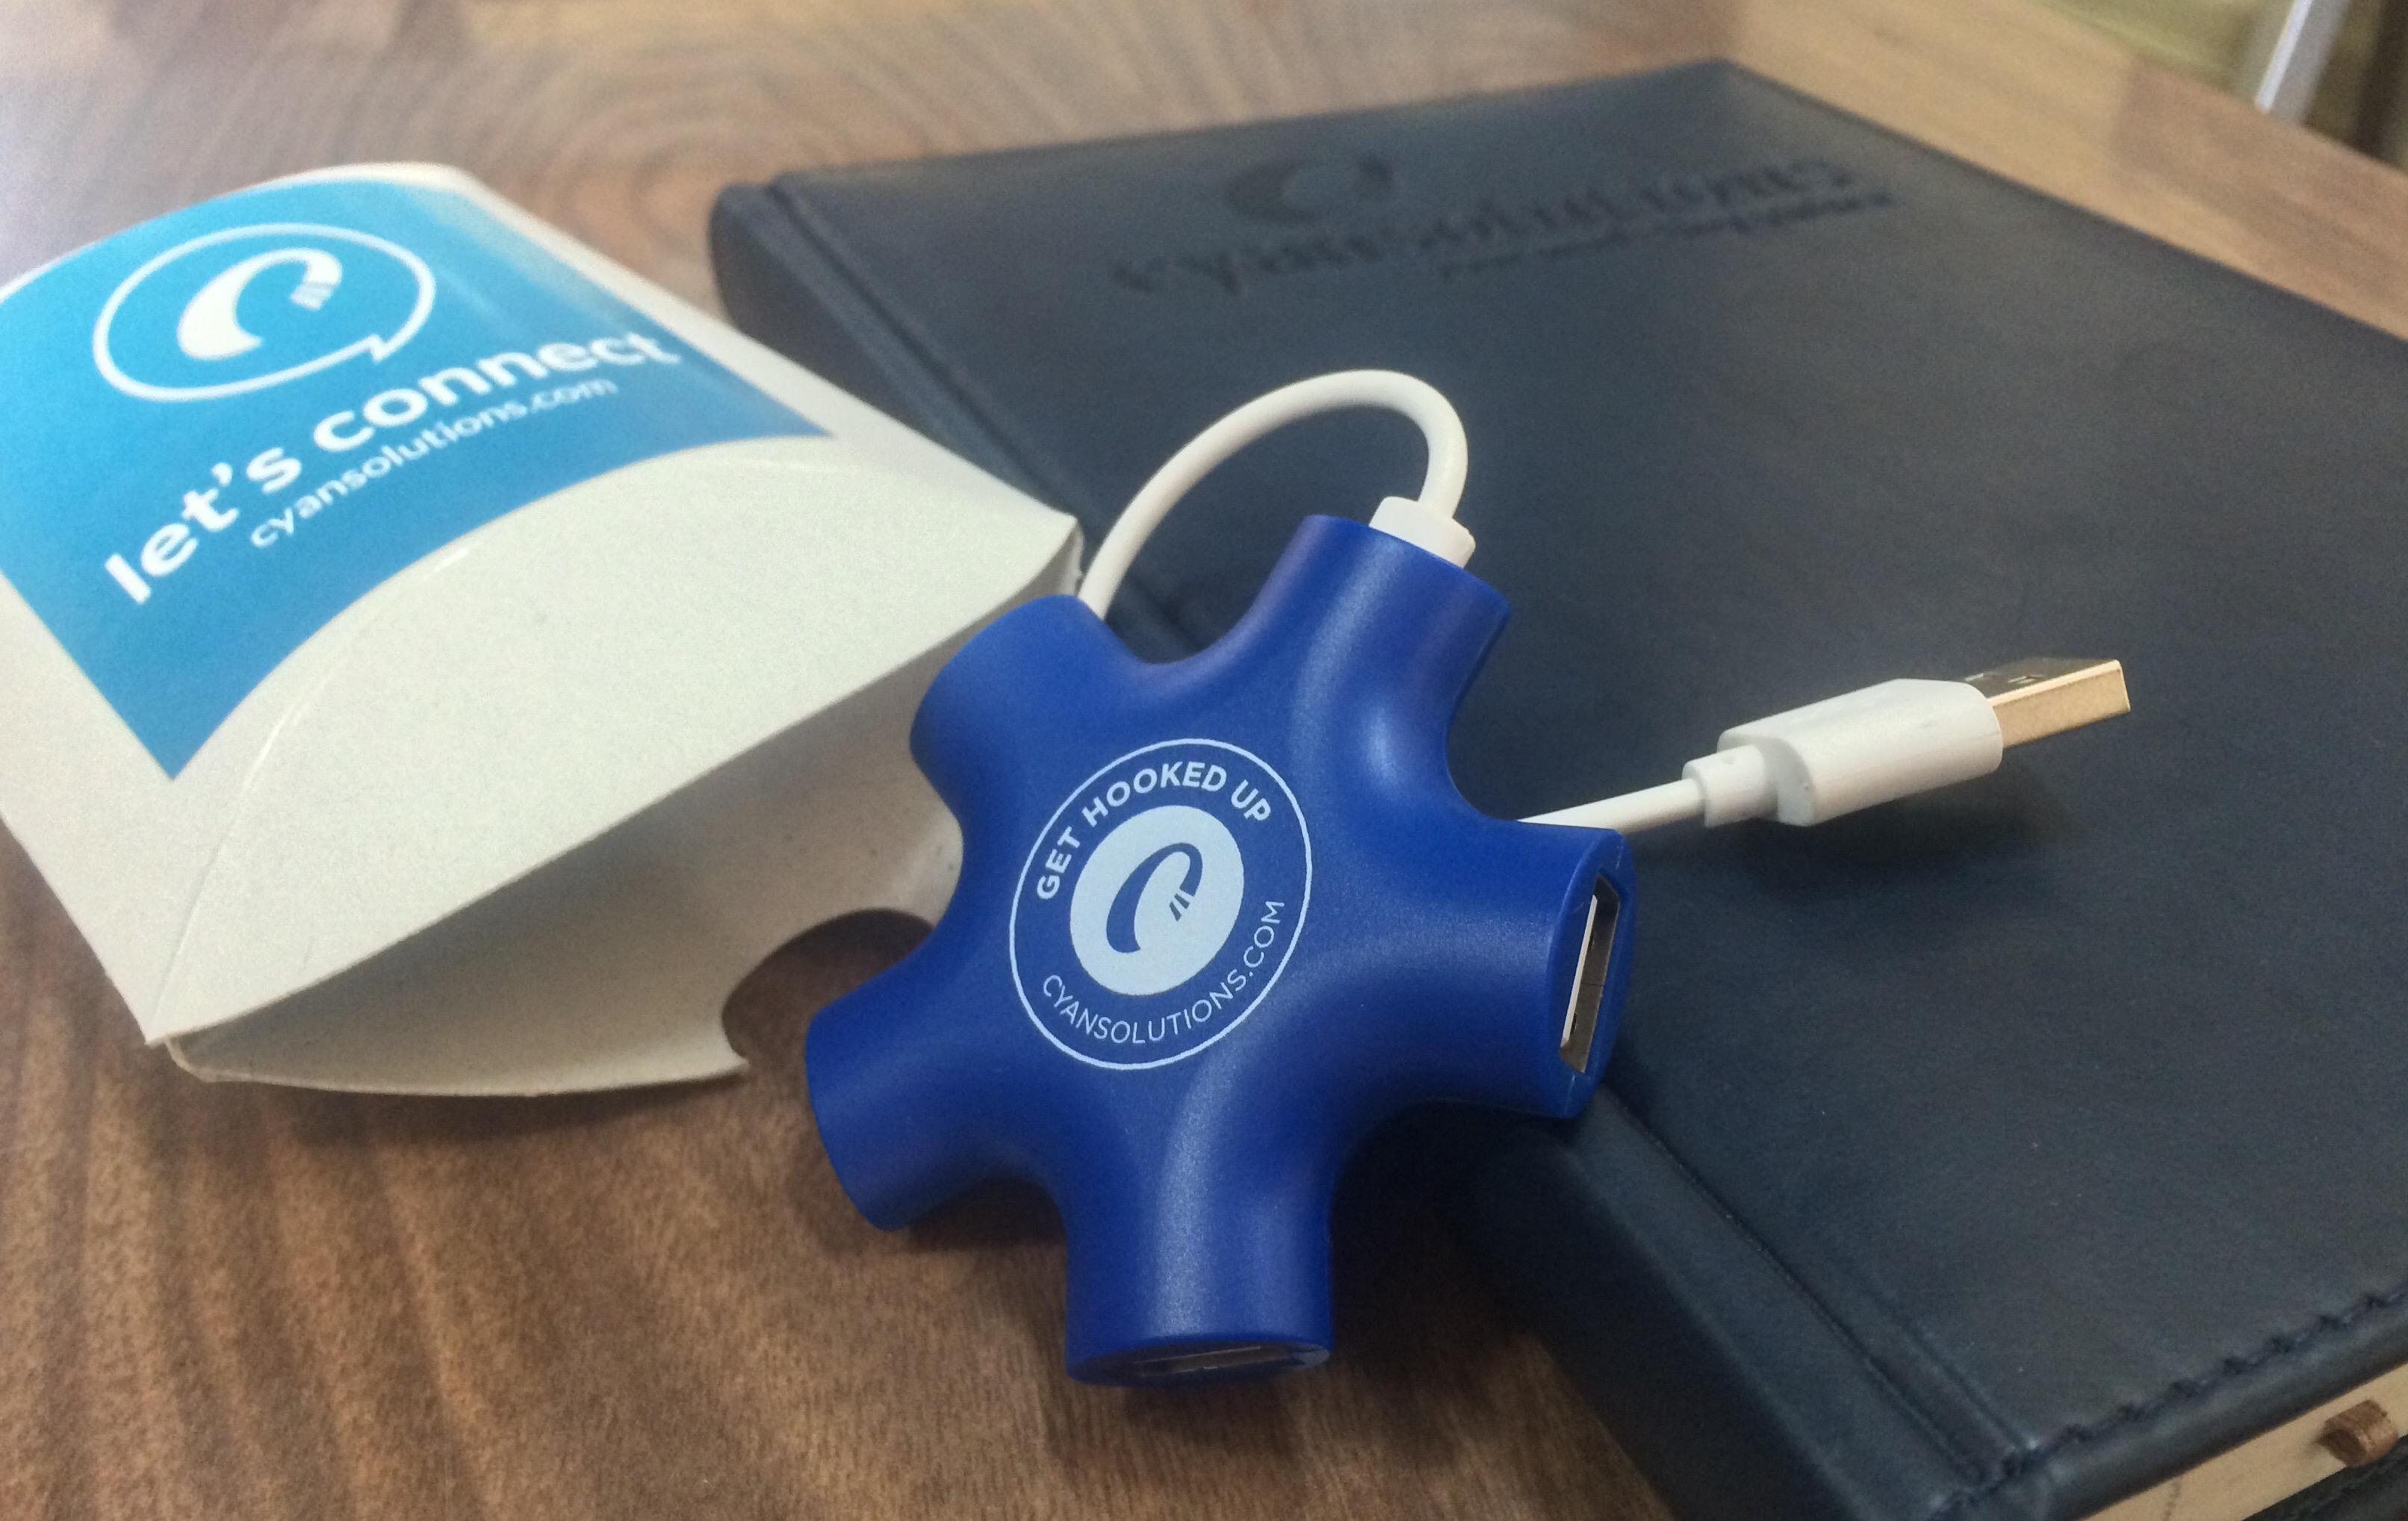 USB Charging Hub Promotional Product